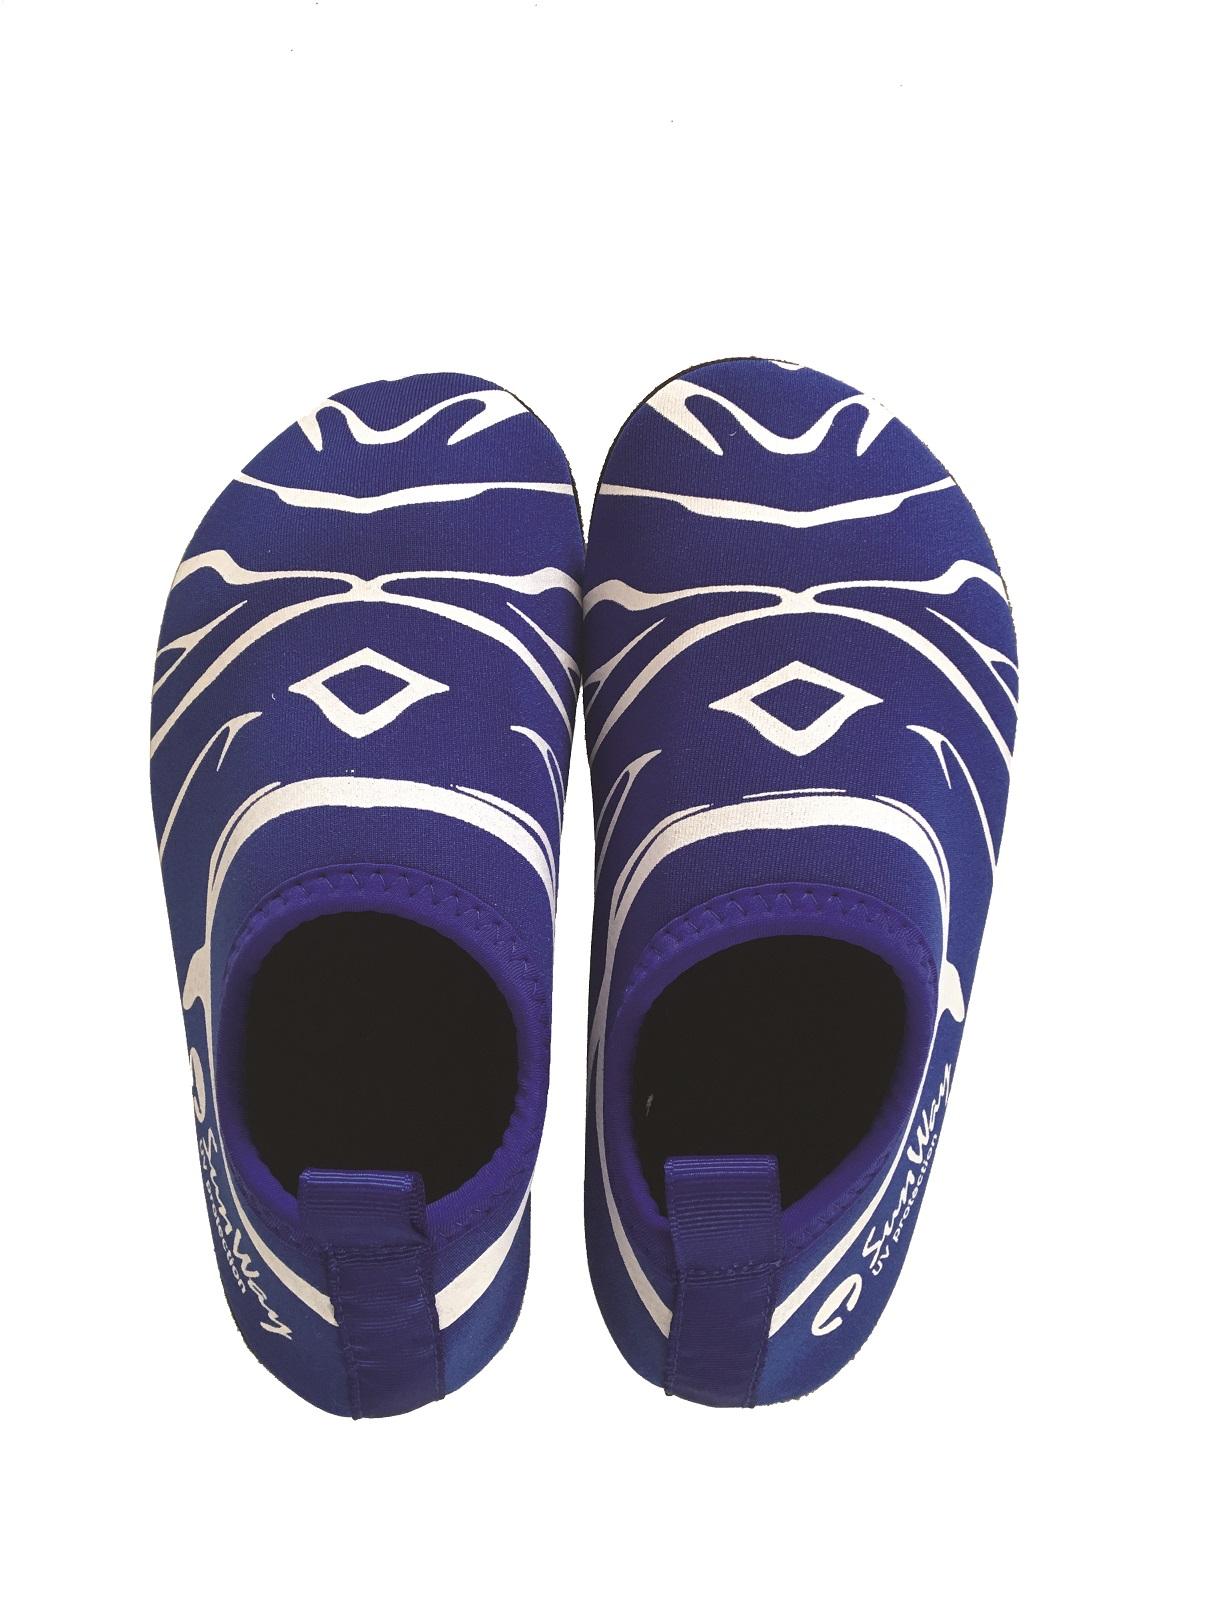 Blue Neoprene Shoes